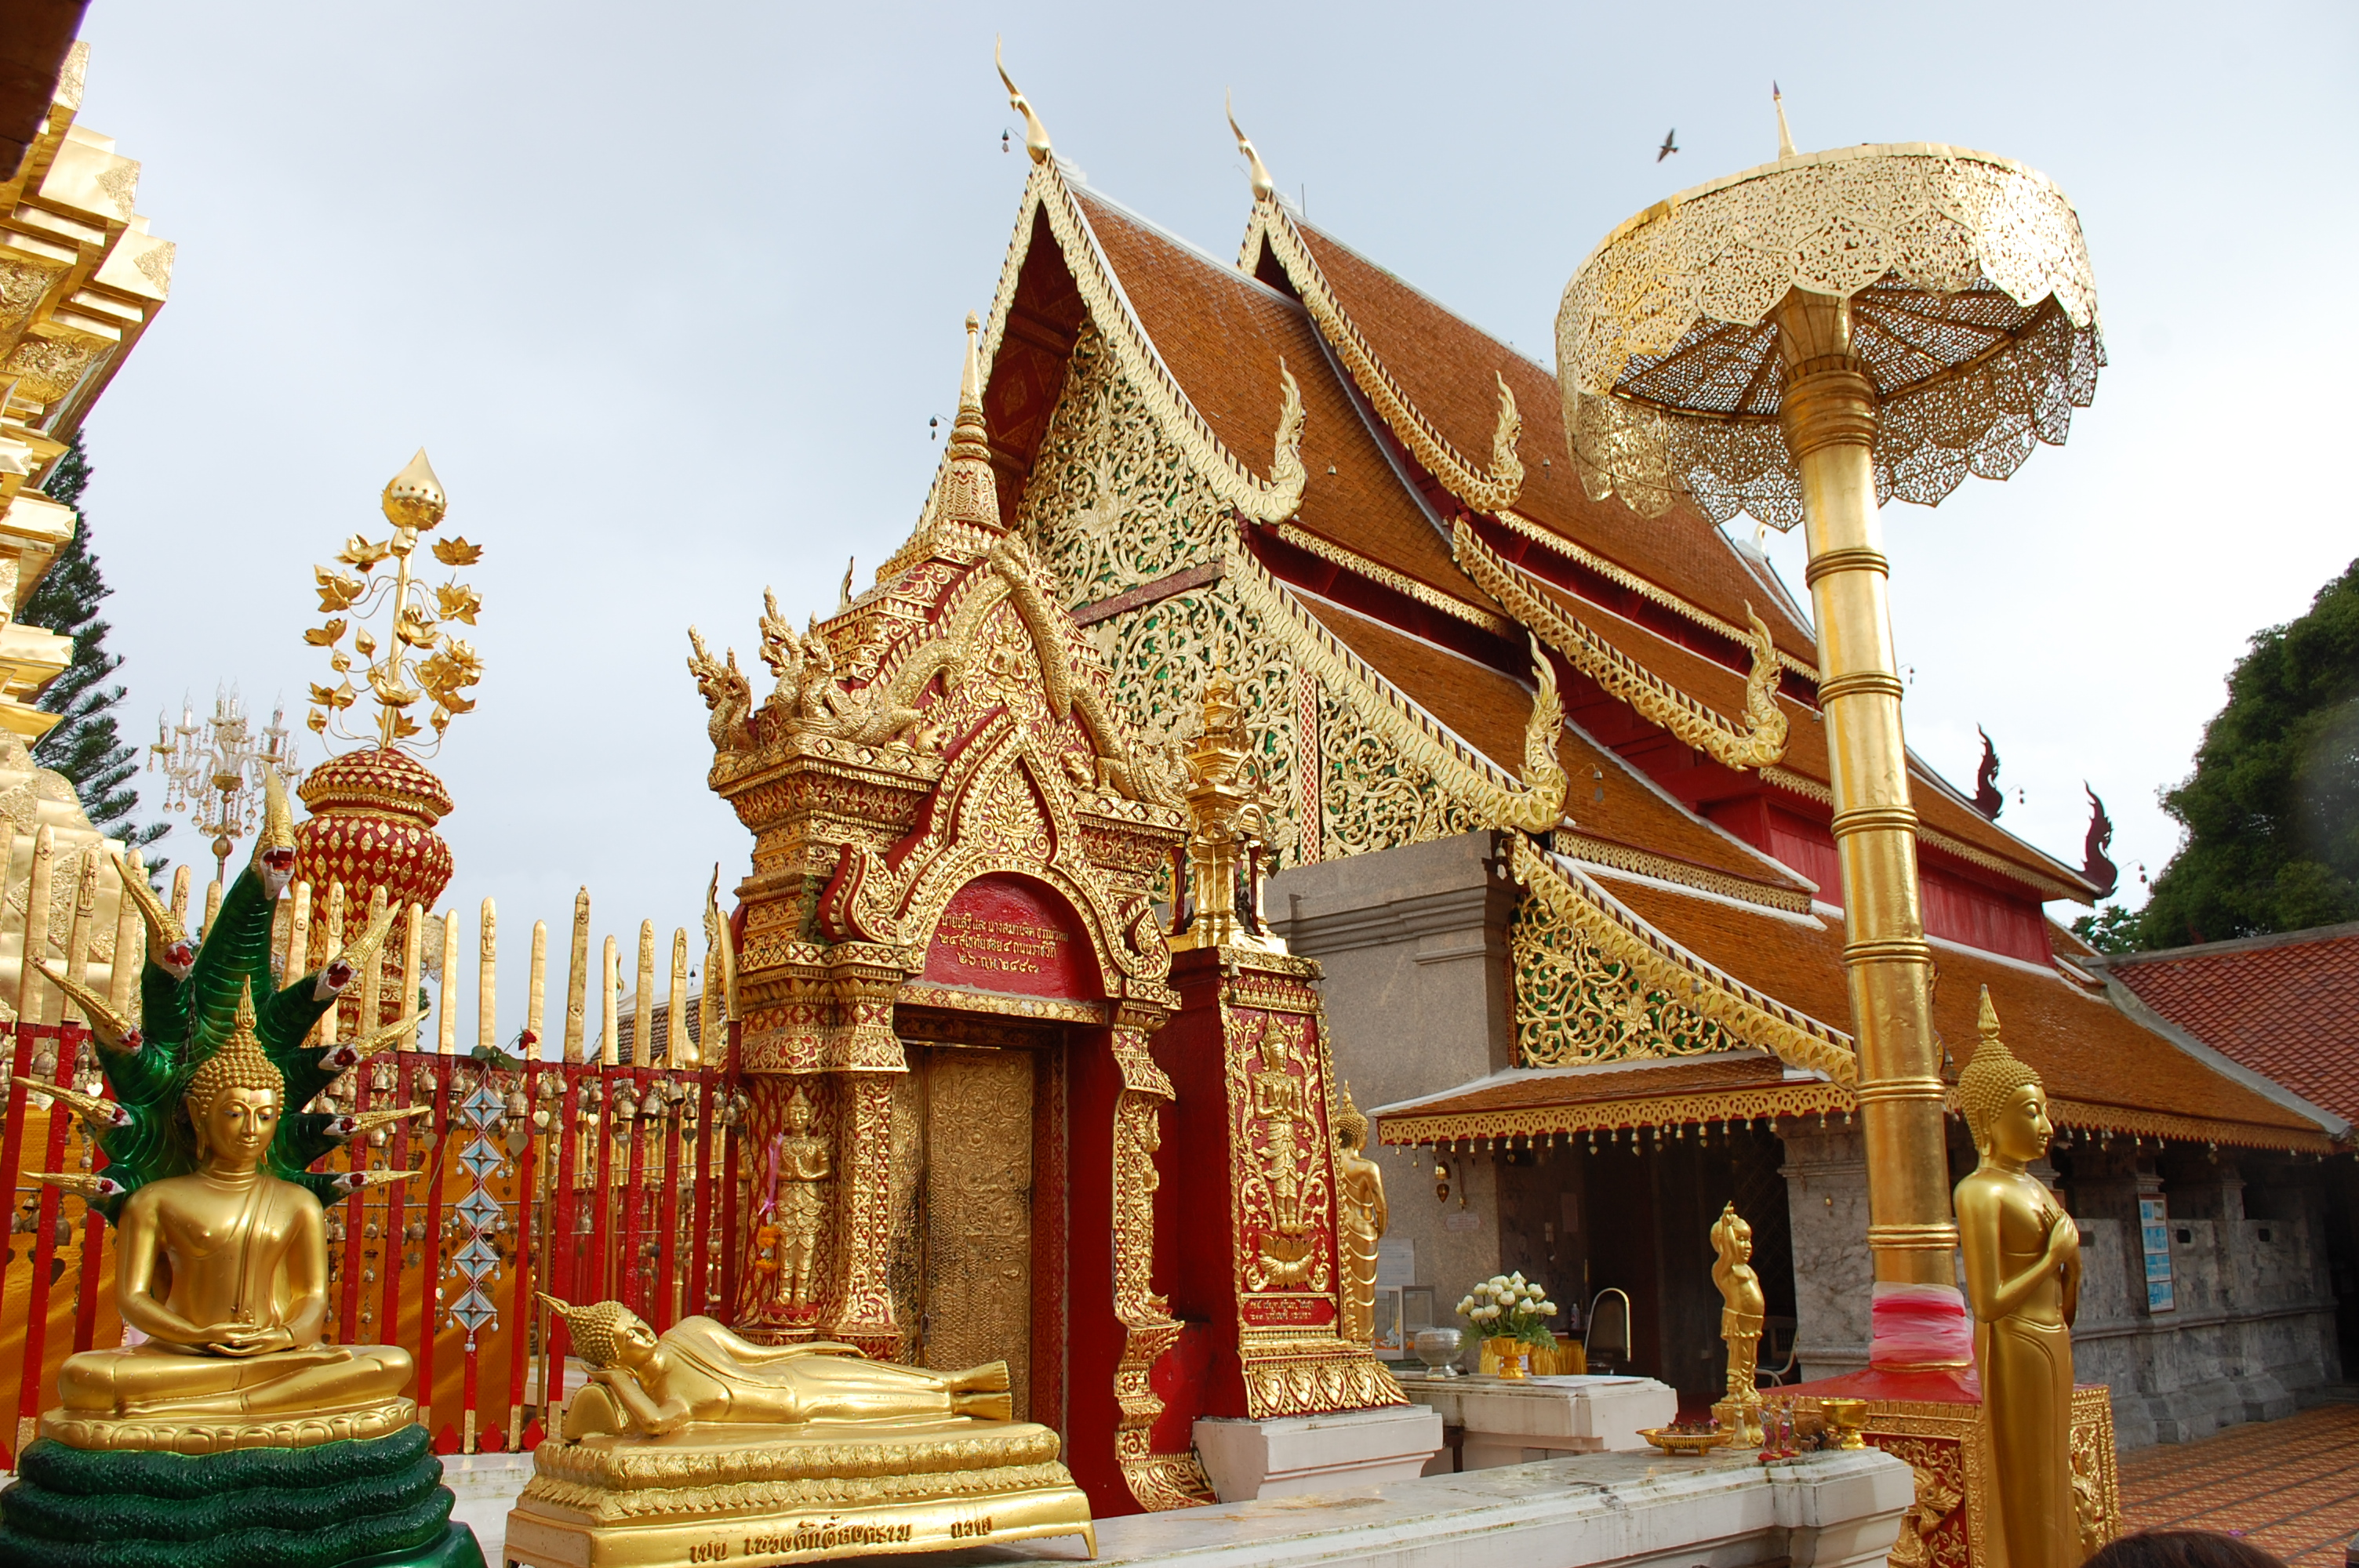 Templo Chiang Mai na Tailândia o que vestir para visitar